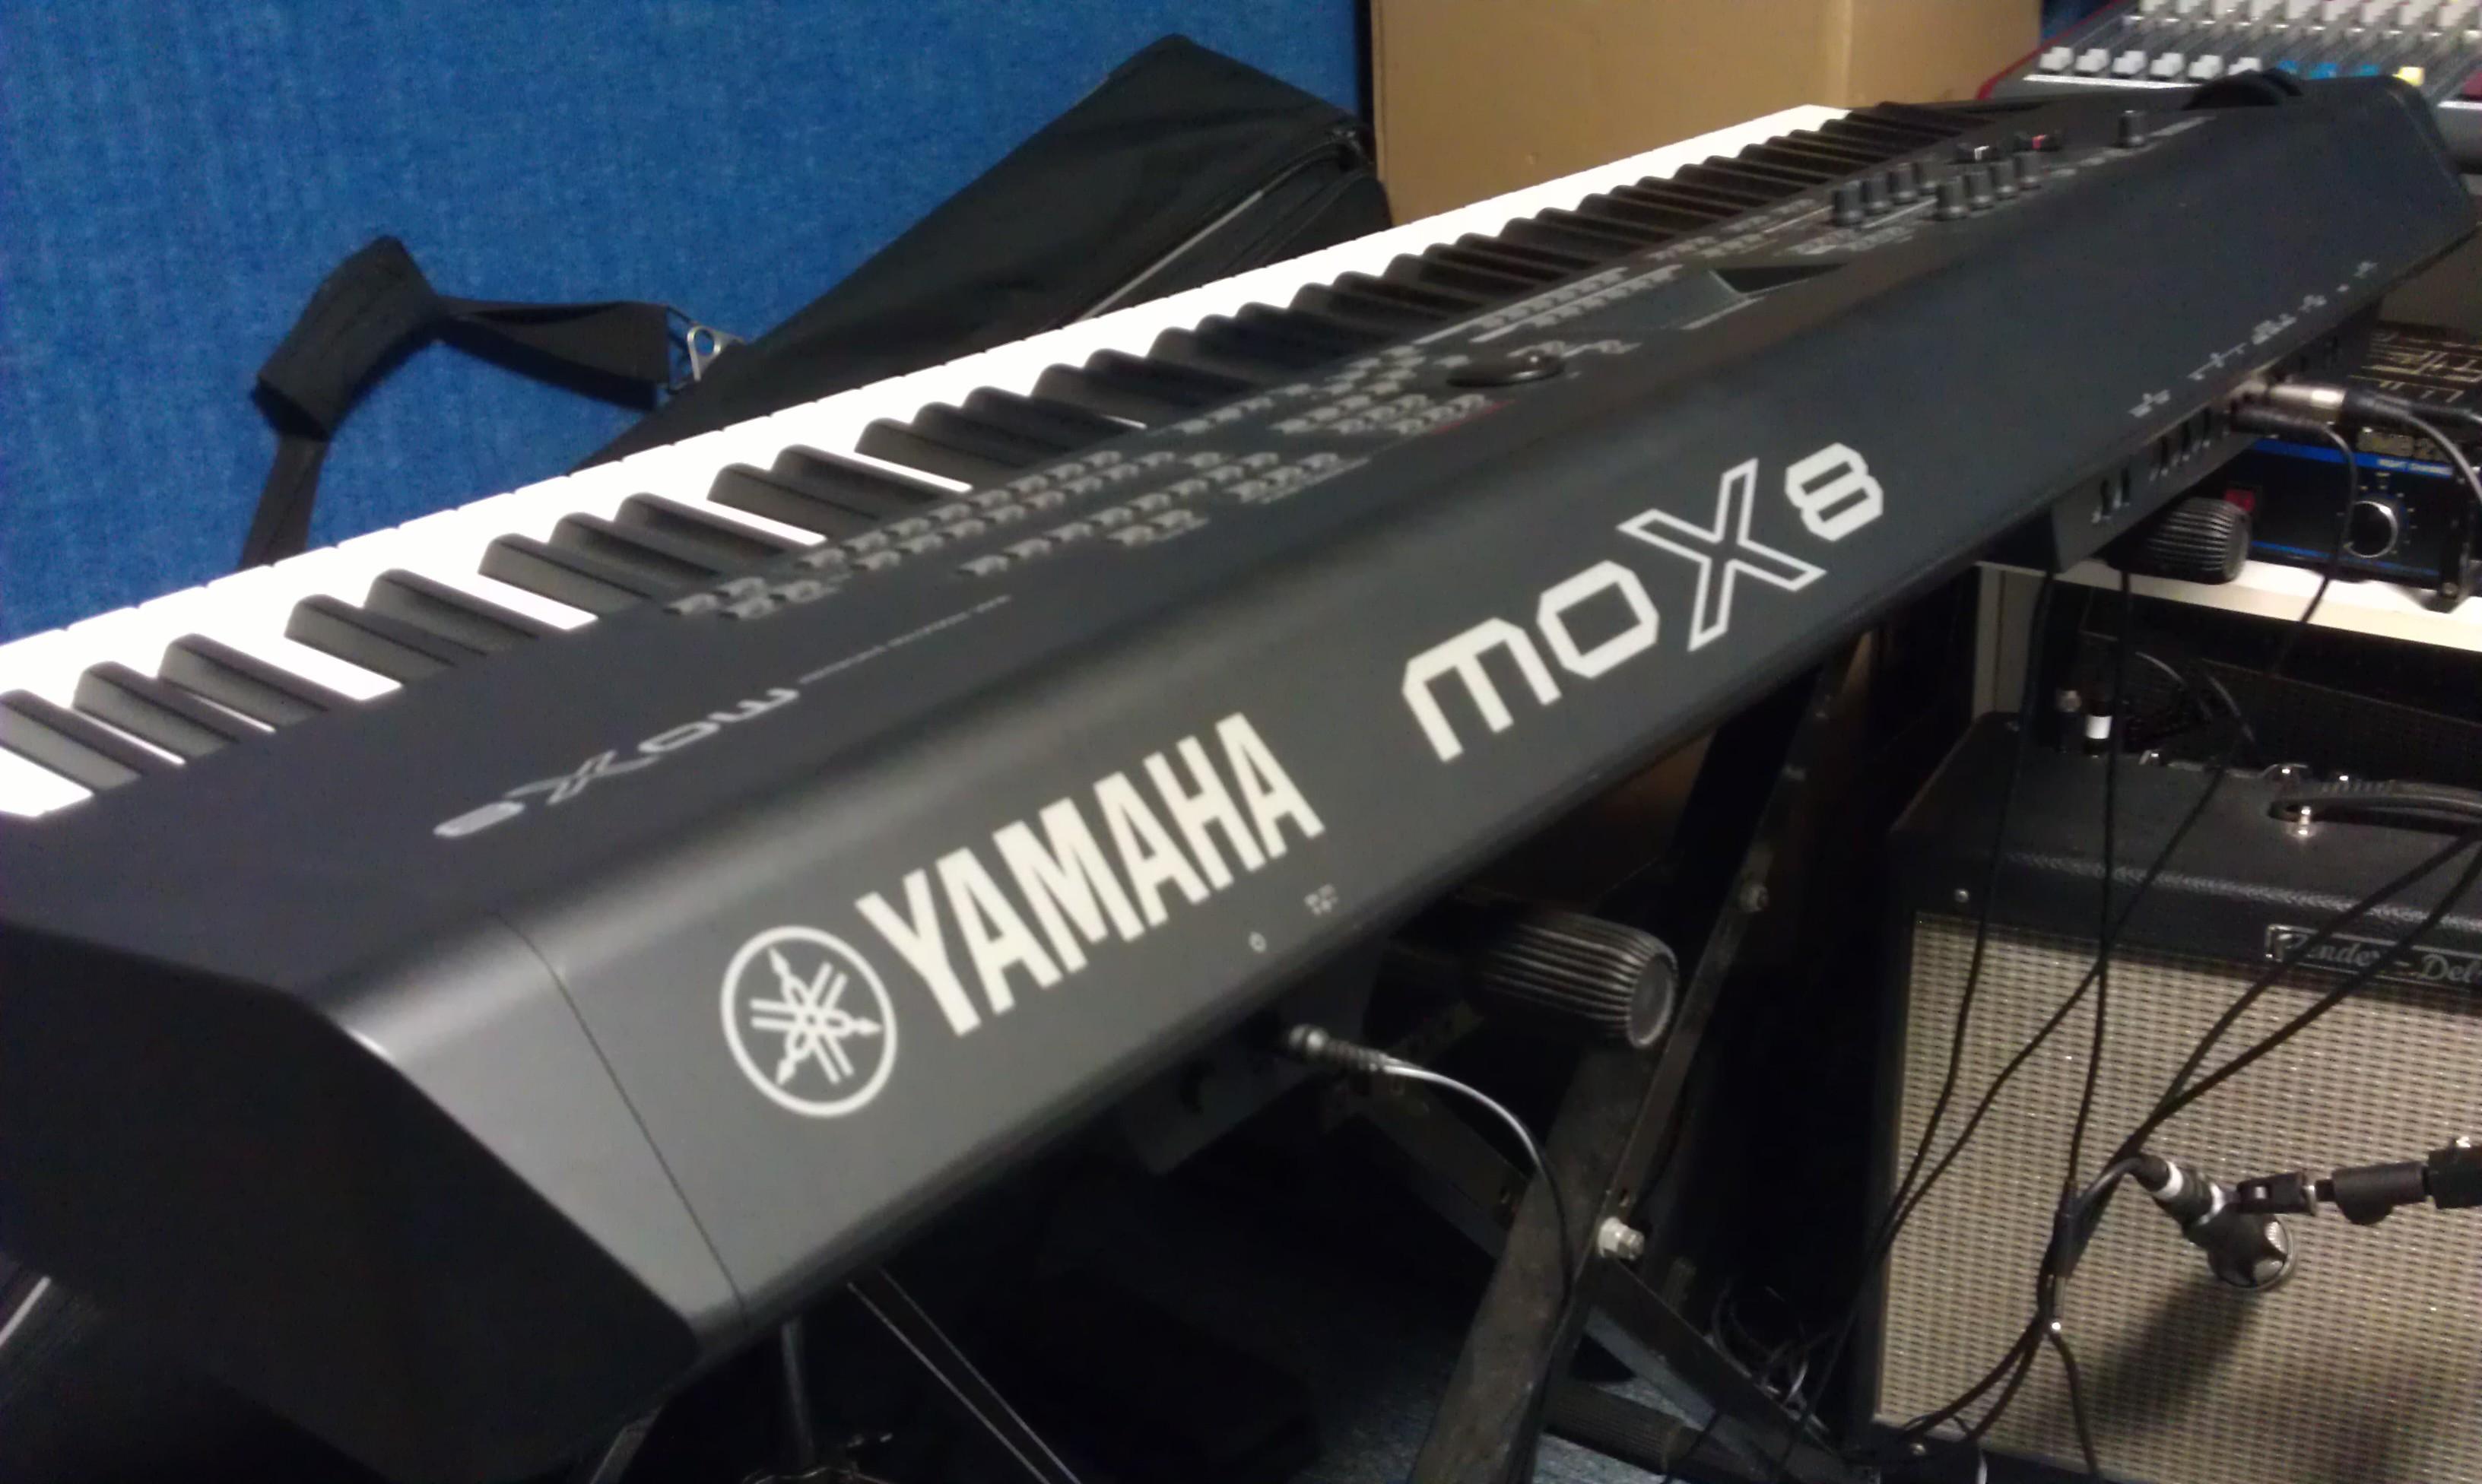 yamaha mox8 image 1443861 audiofanzine rh en audiofanzine com Yamaha MOX8 YouTube Yamaha MOX8 Demo